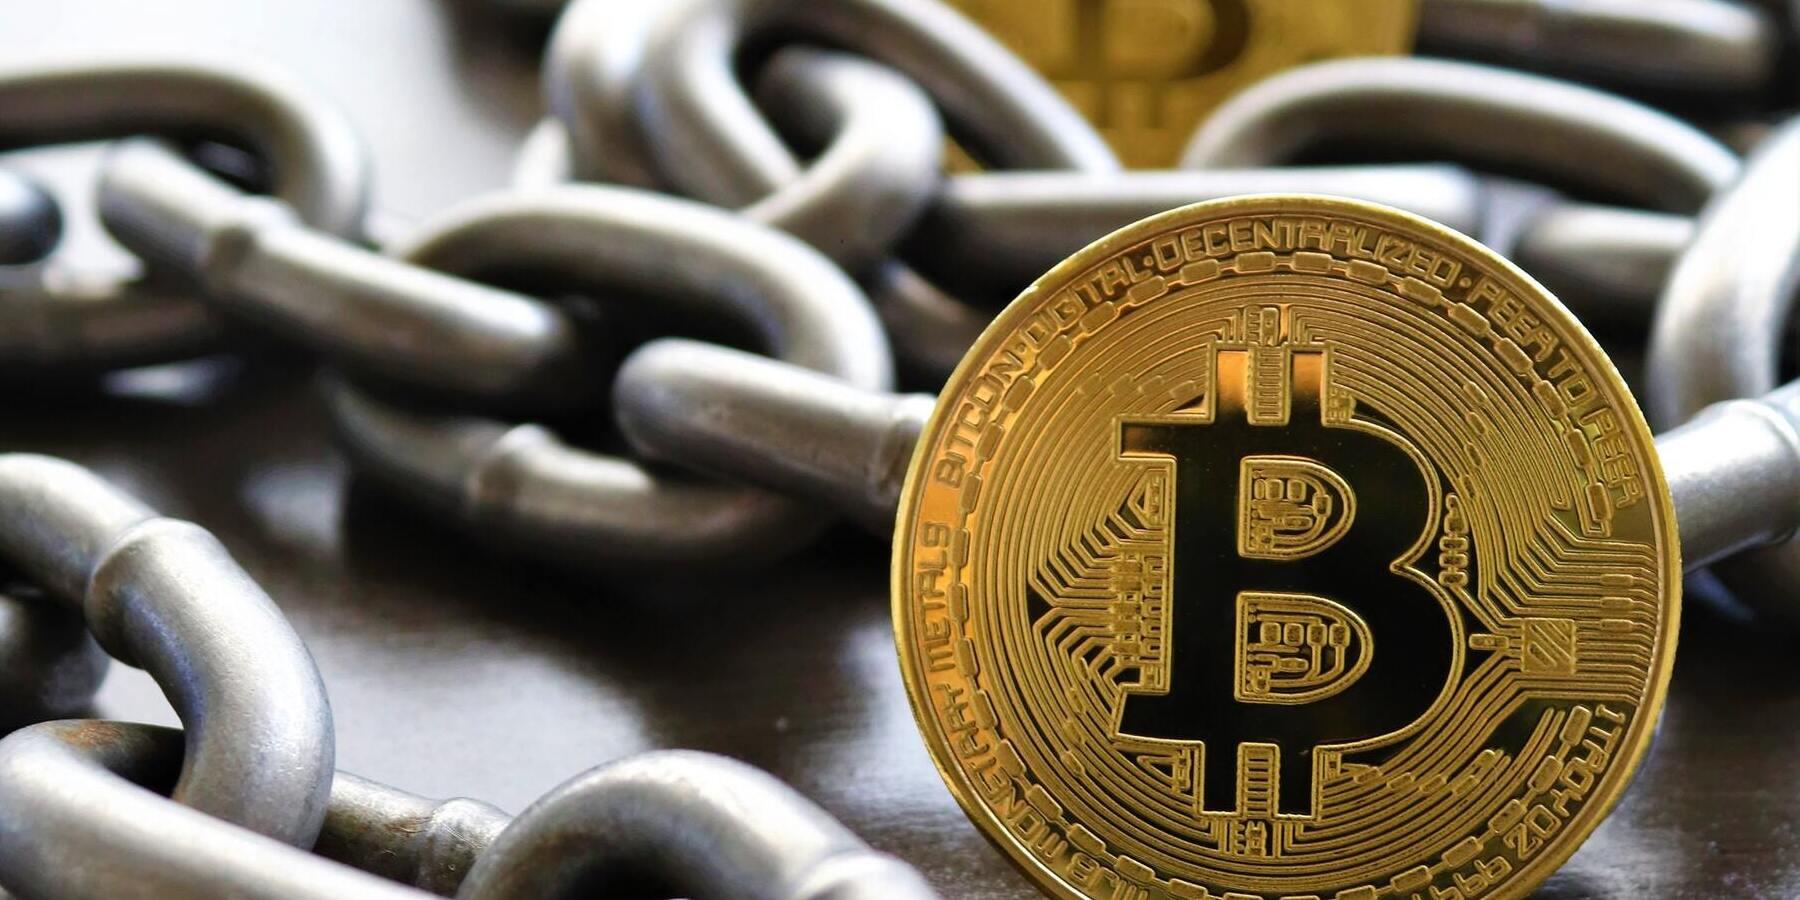 Tesla-Chef Musk sorgt fuer Kurssturz bei Bitcoin - Kryptowaehrungen Geldmuenze